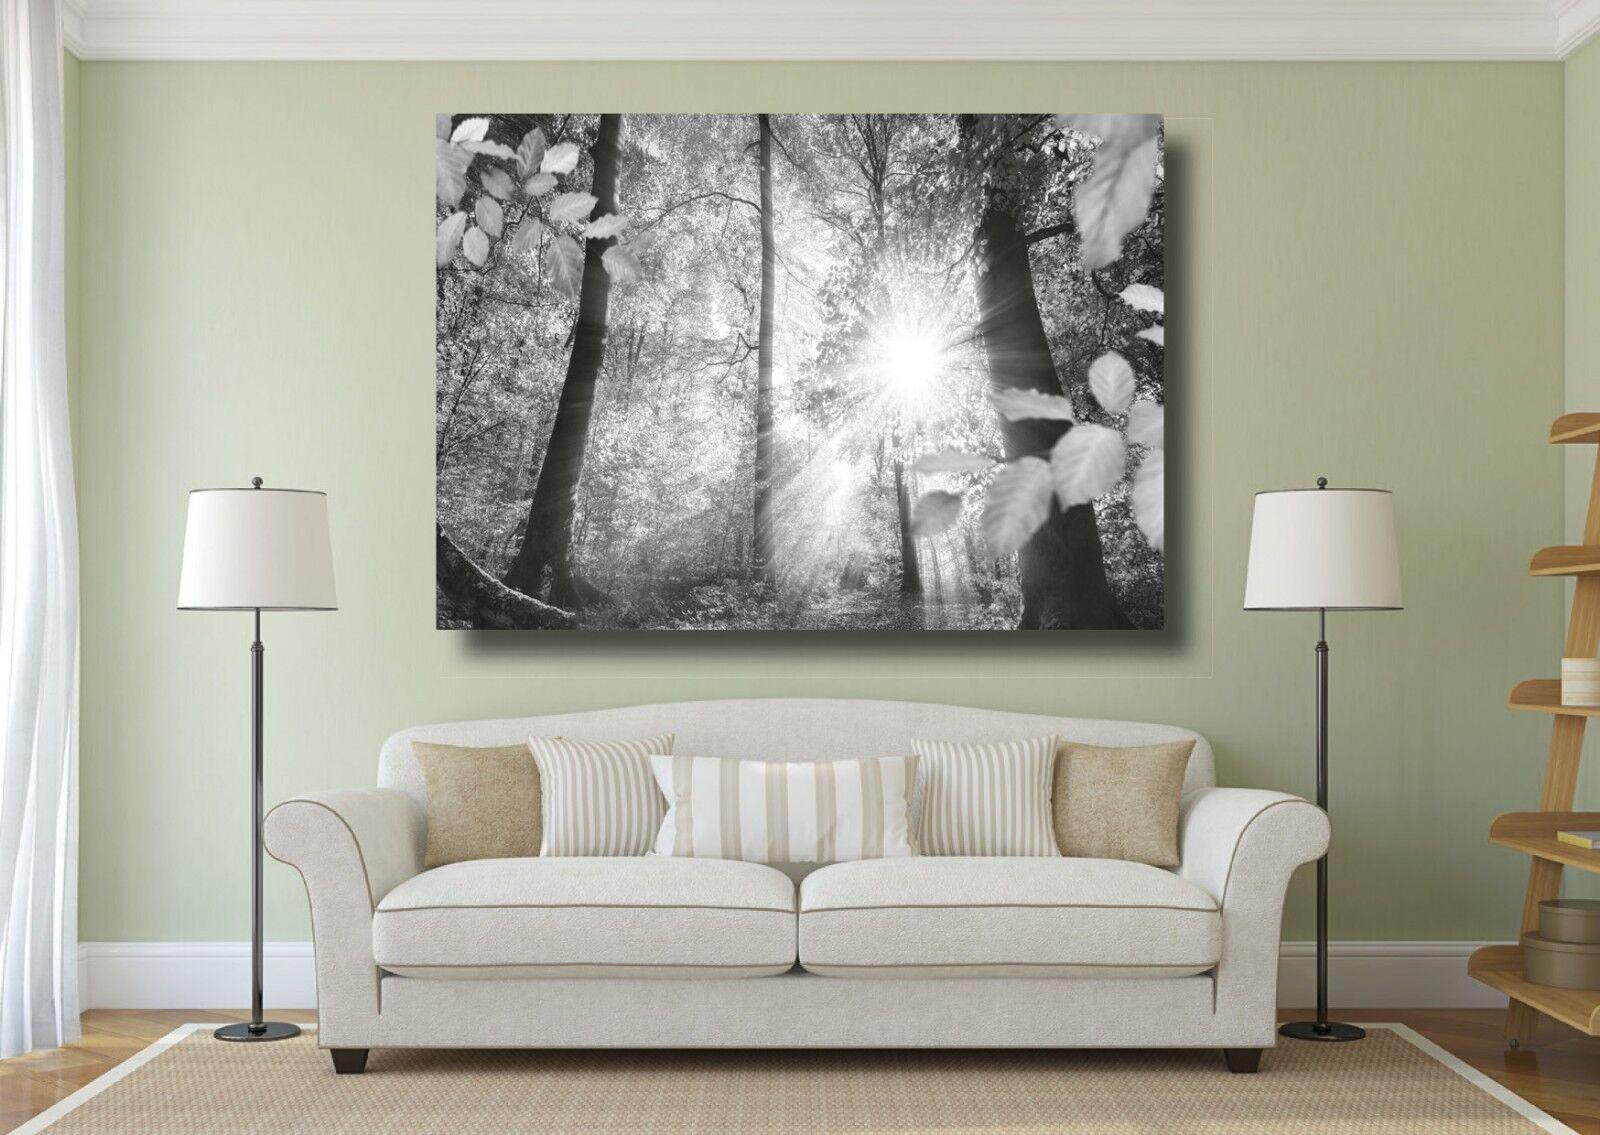 Beautiful Tree Forrest landscape Large Box CANVAS PRINT  - A0 A1 A2 A3 A4 Größes